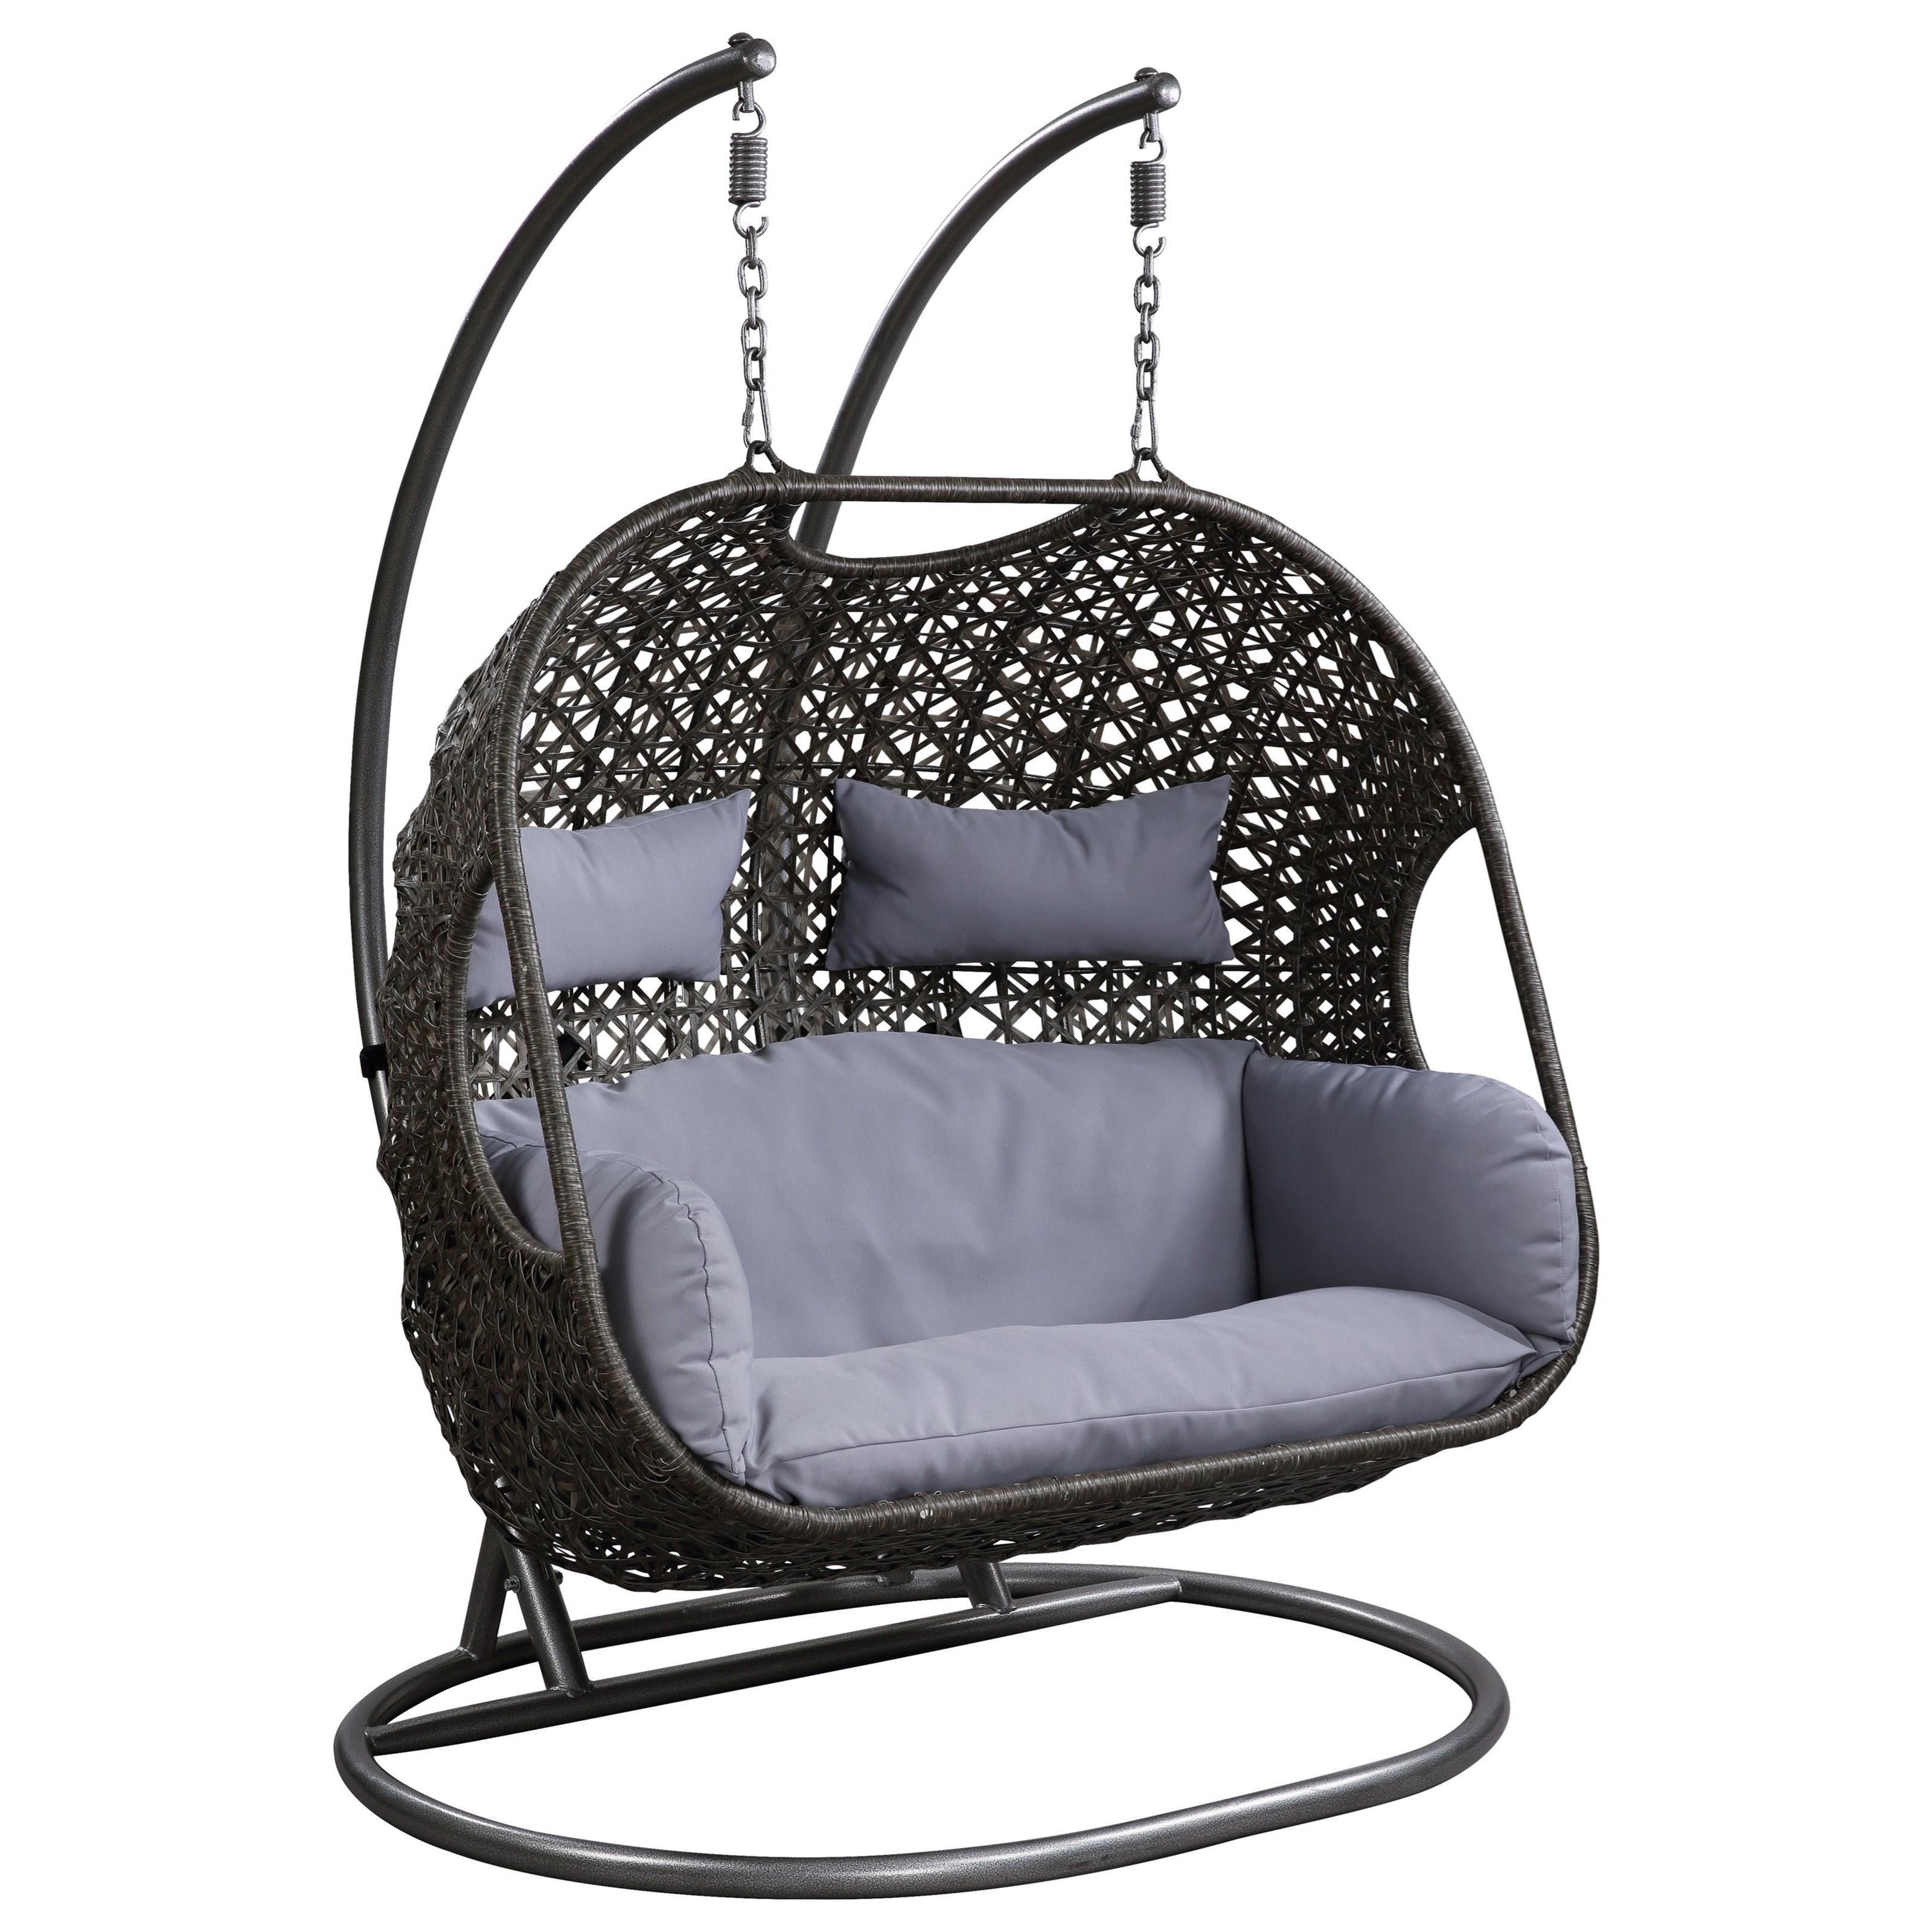 acme furniture vasant 45084 patio swing